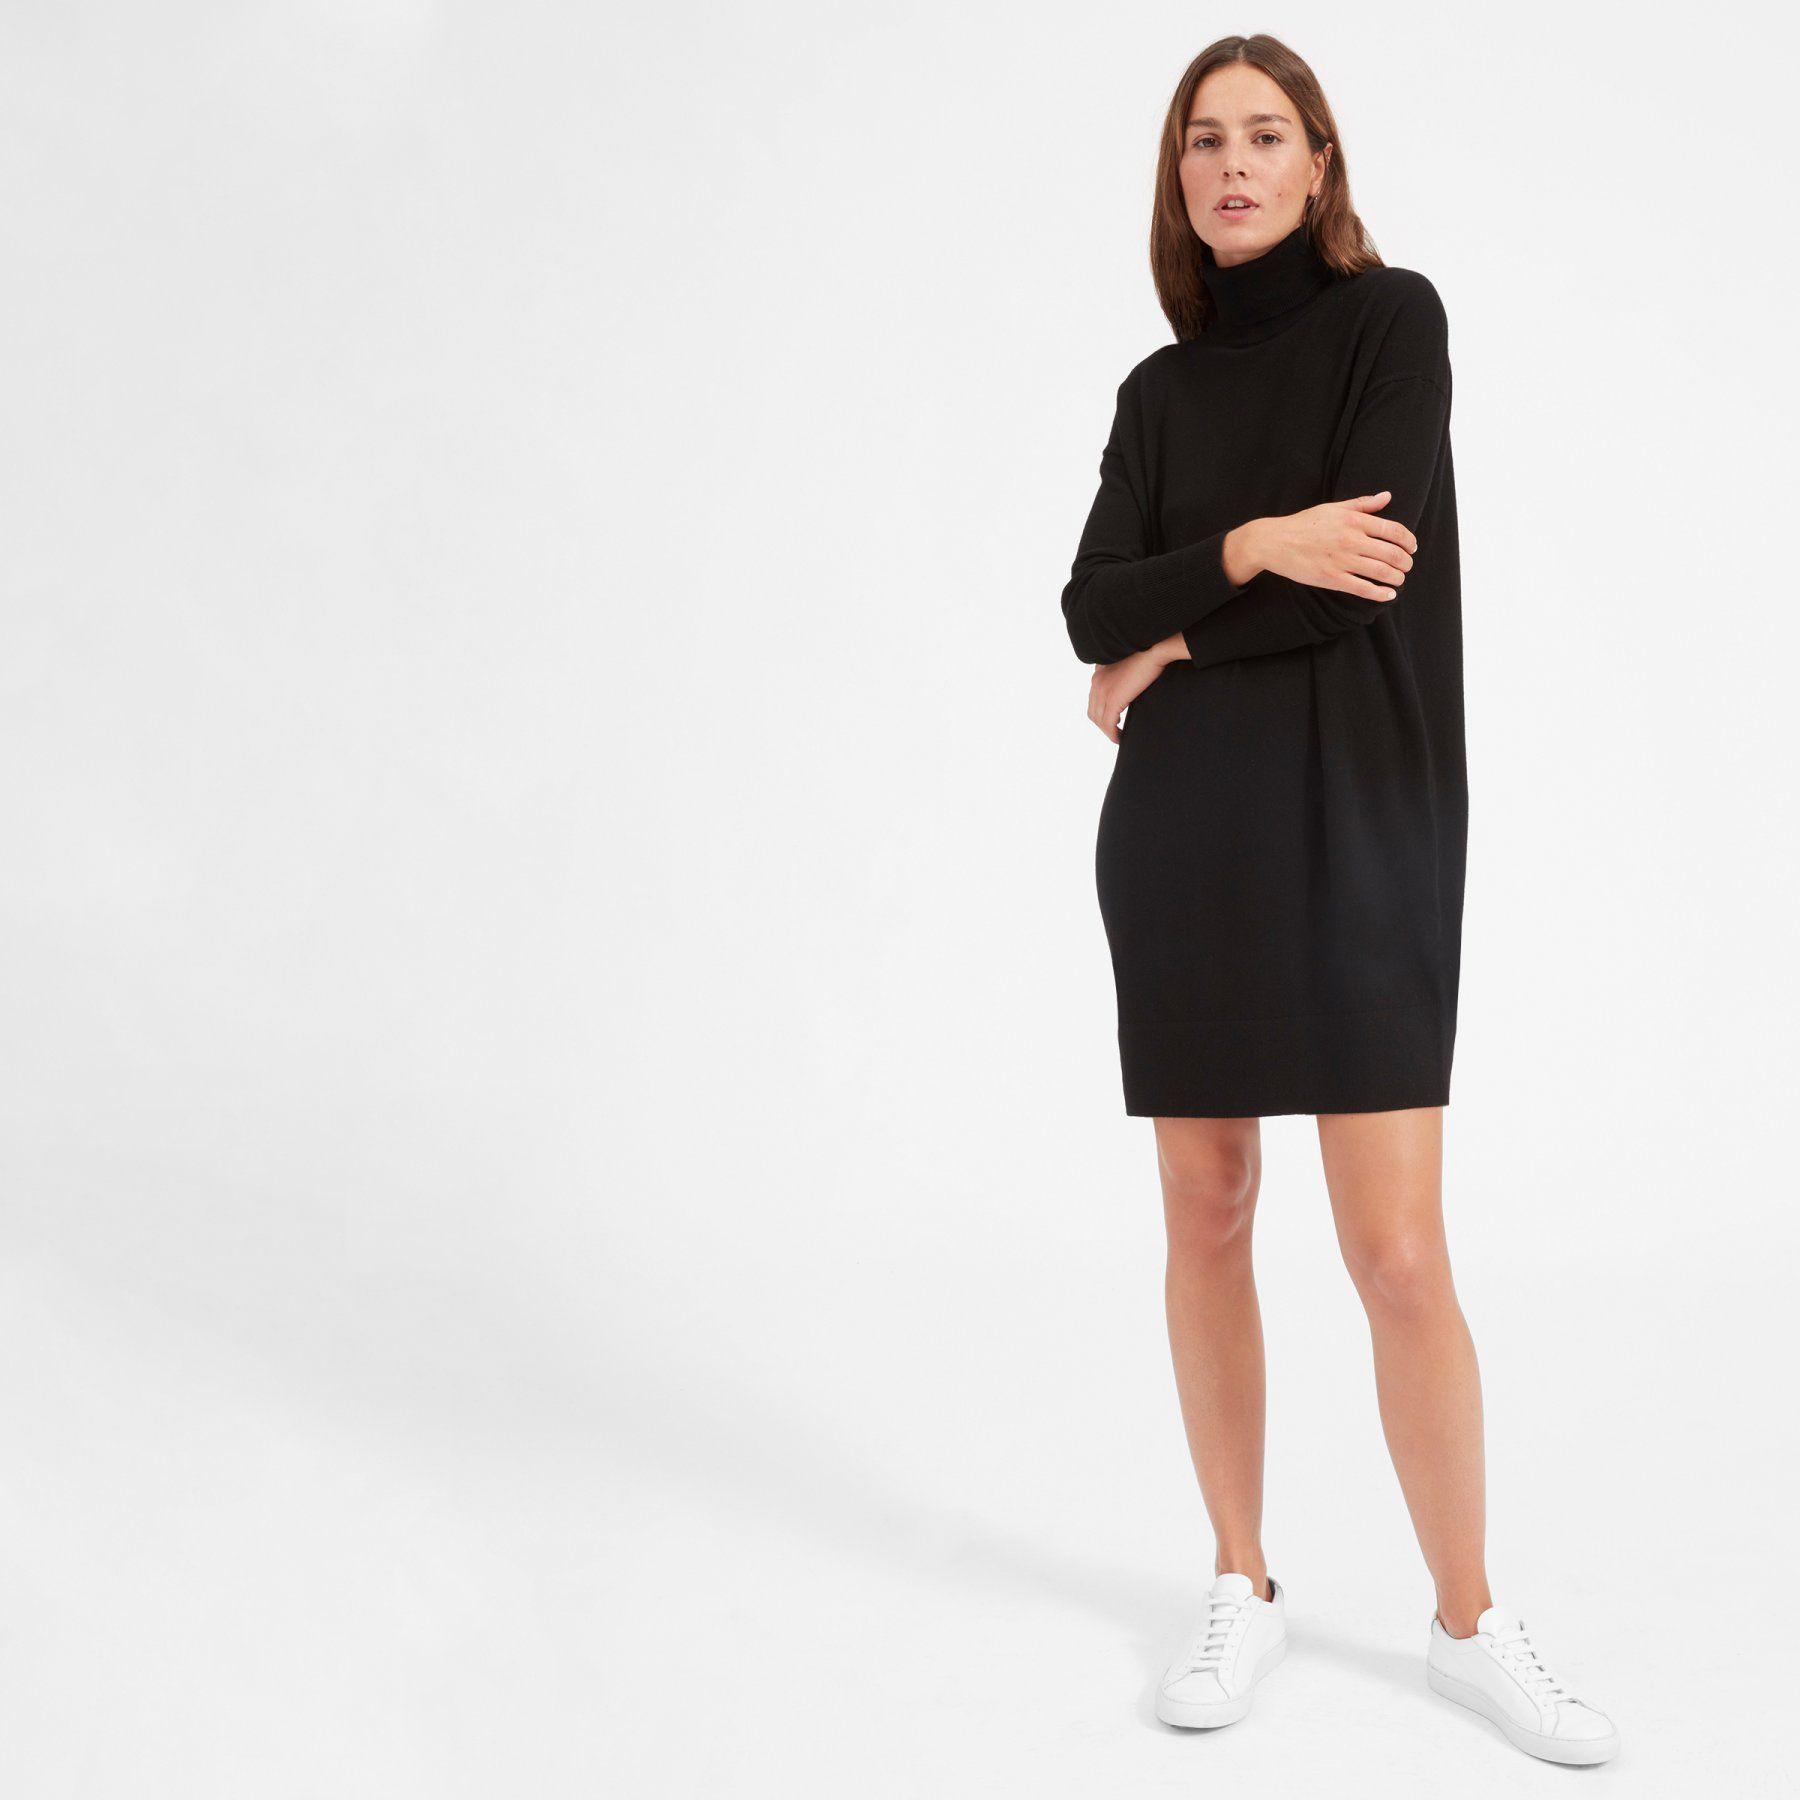 fd322c4dd07 Women s Cashmere Turtleneck Dress